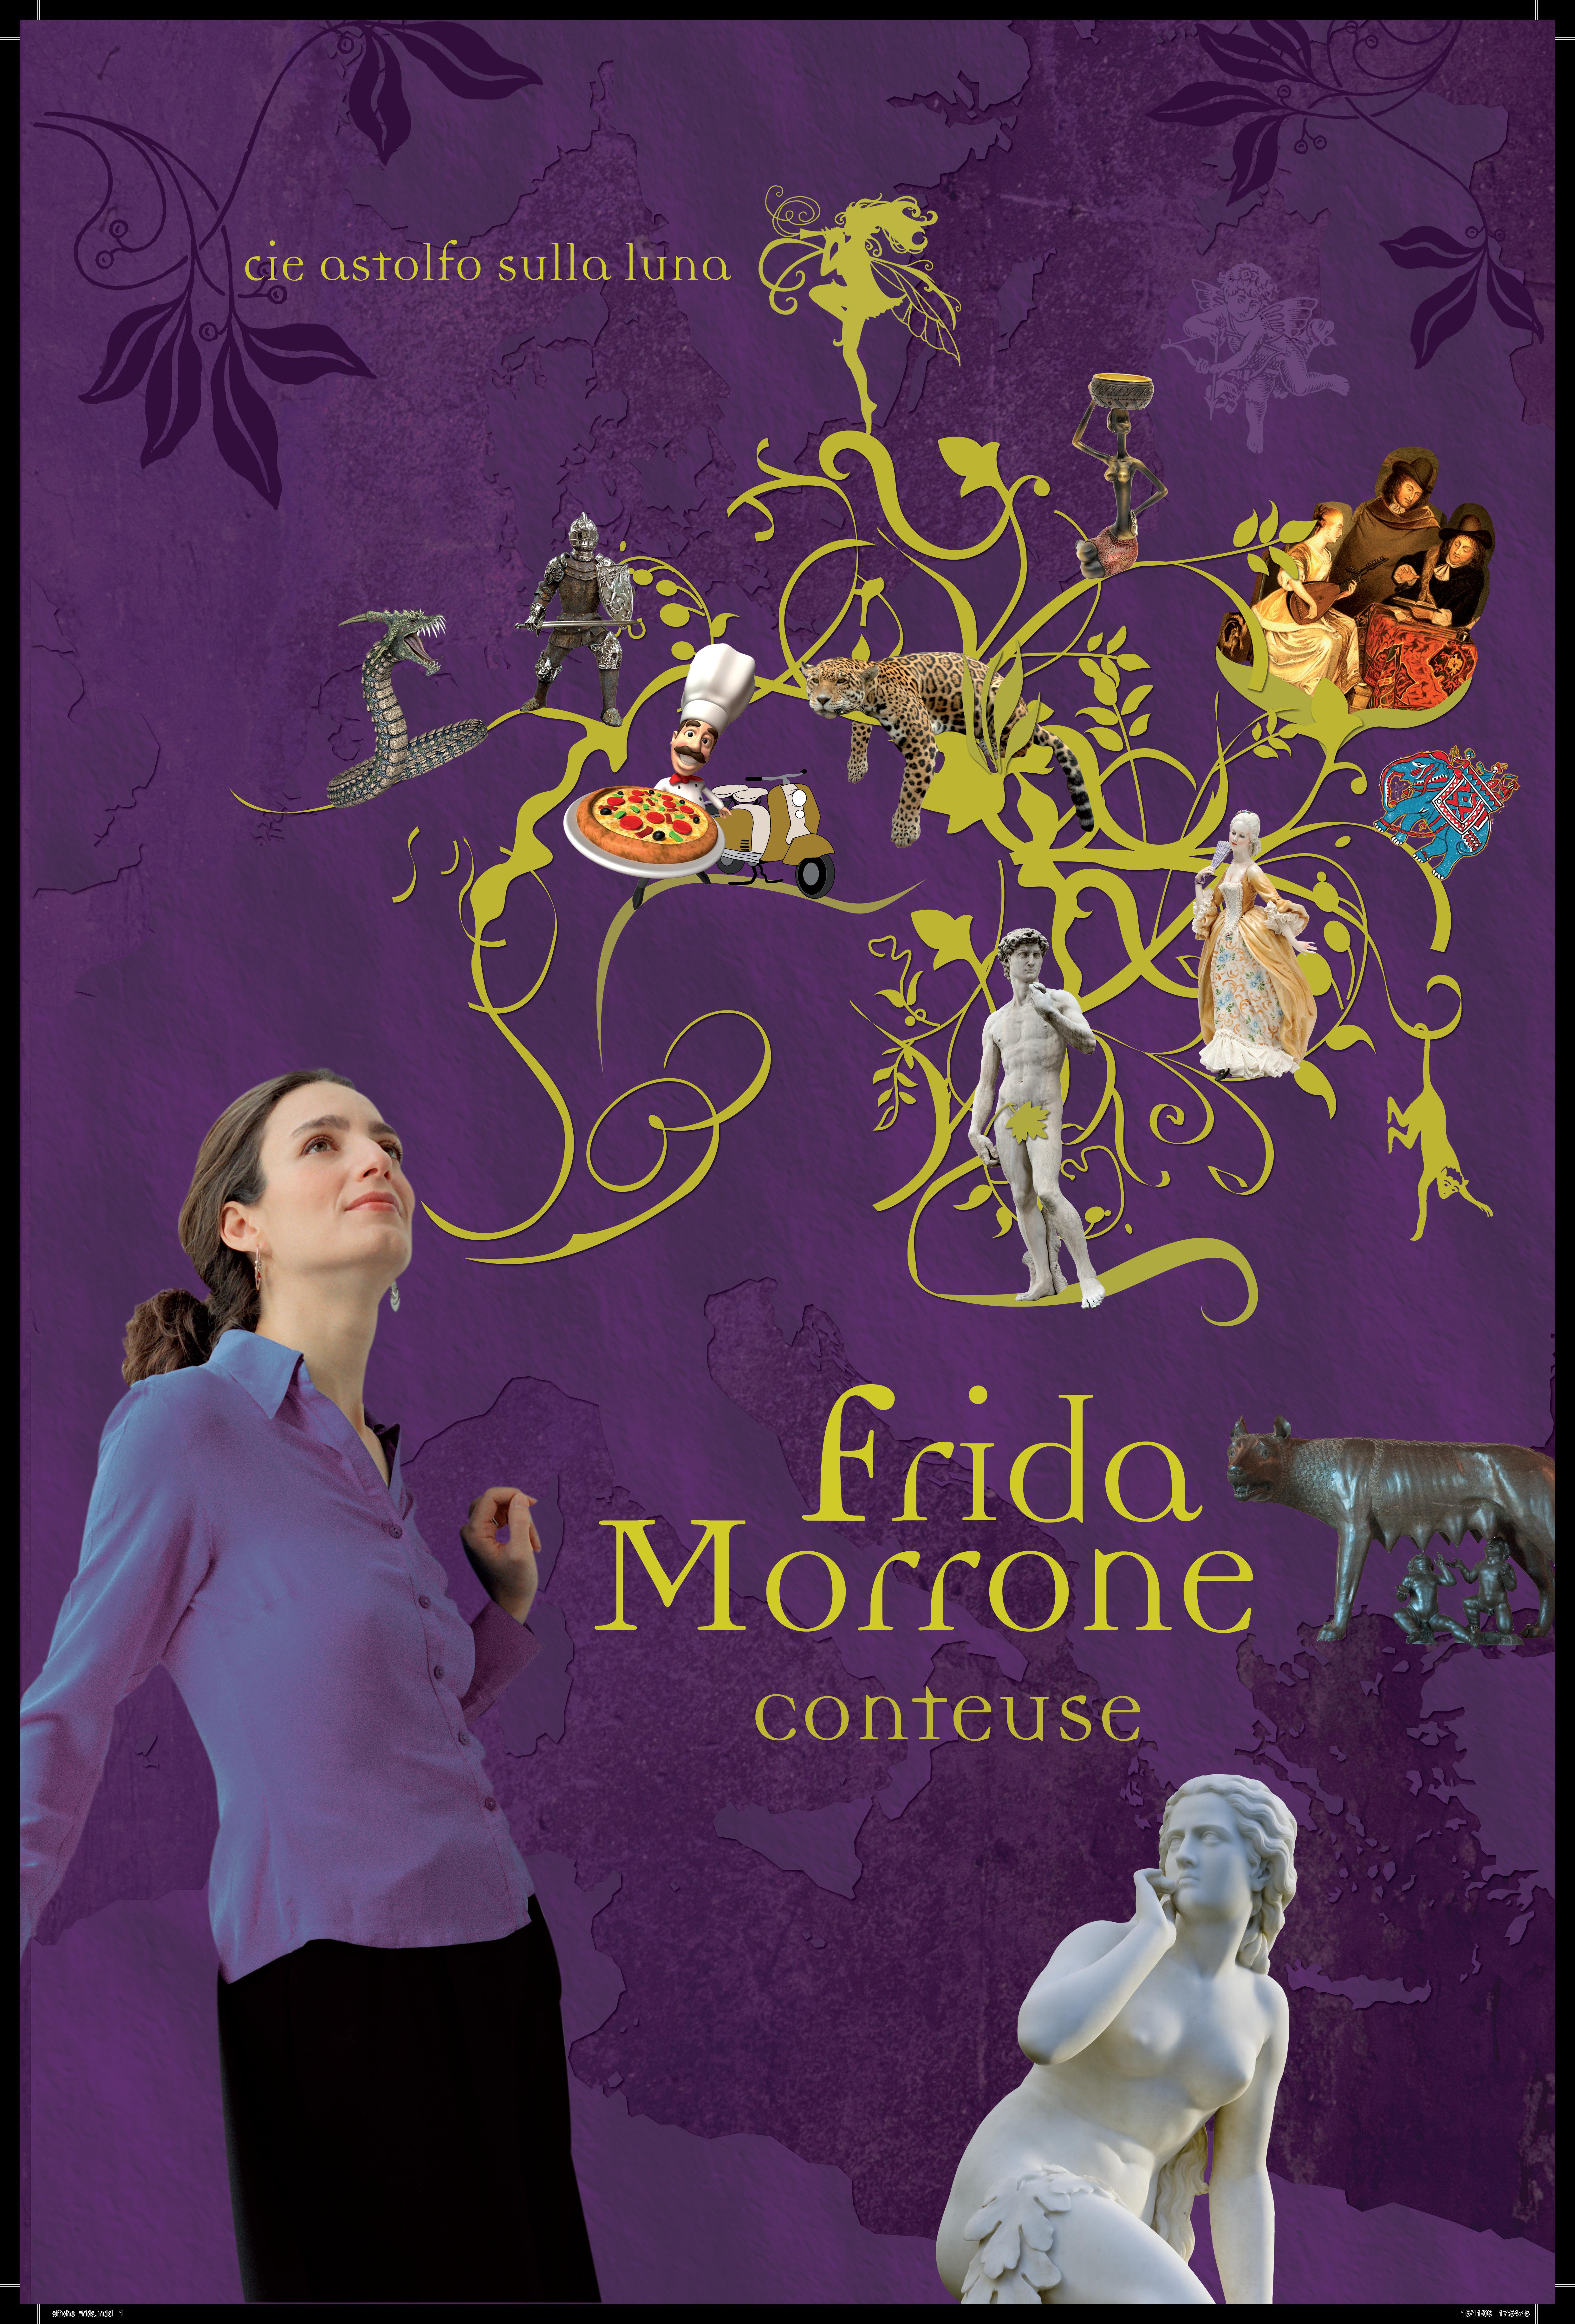 frida morrone Frida Morrone affiche officielle frida morrone